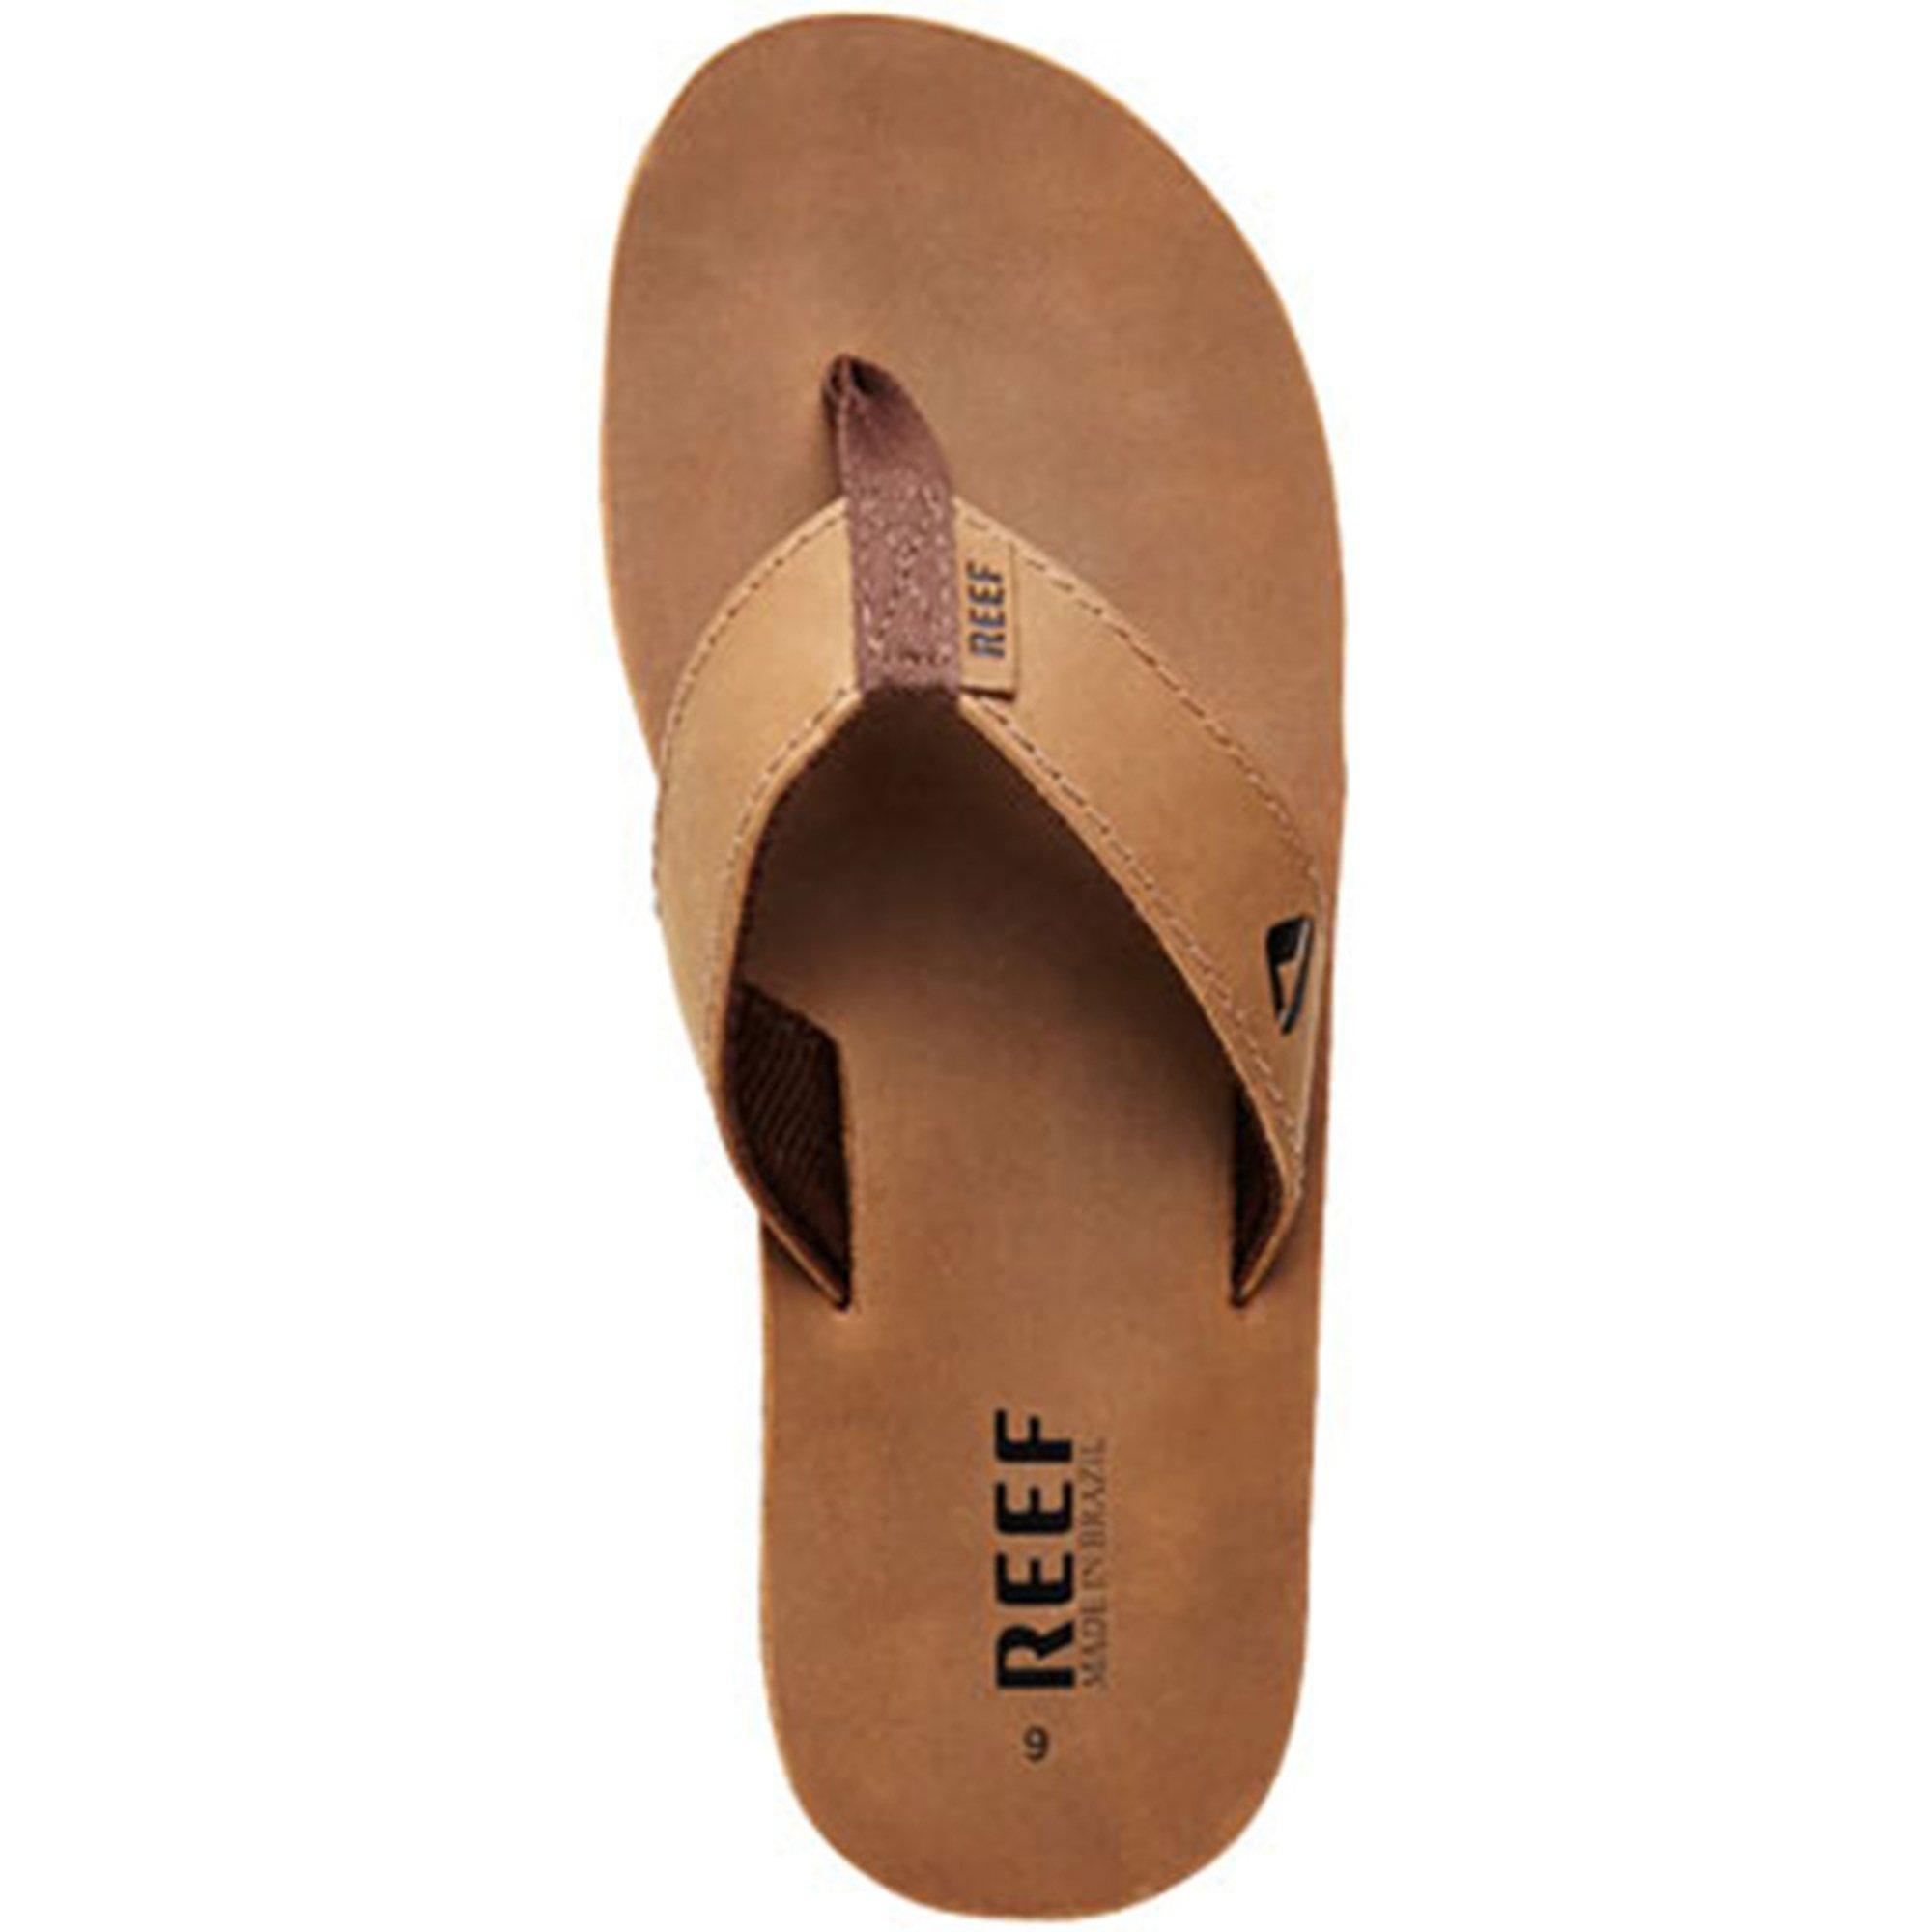 6c4630b71552 Reef Men s Leather Smoothy Thong Sandal